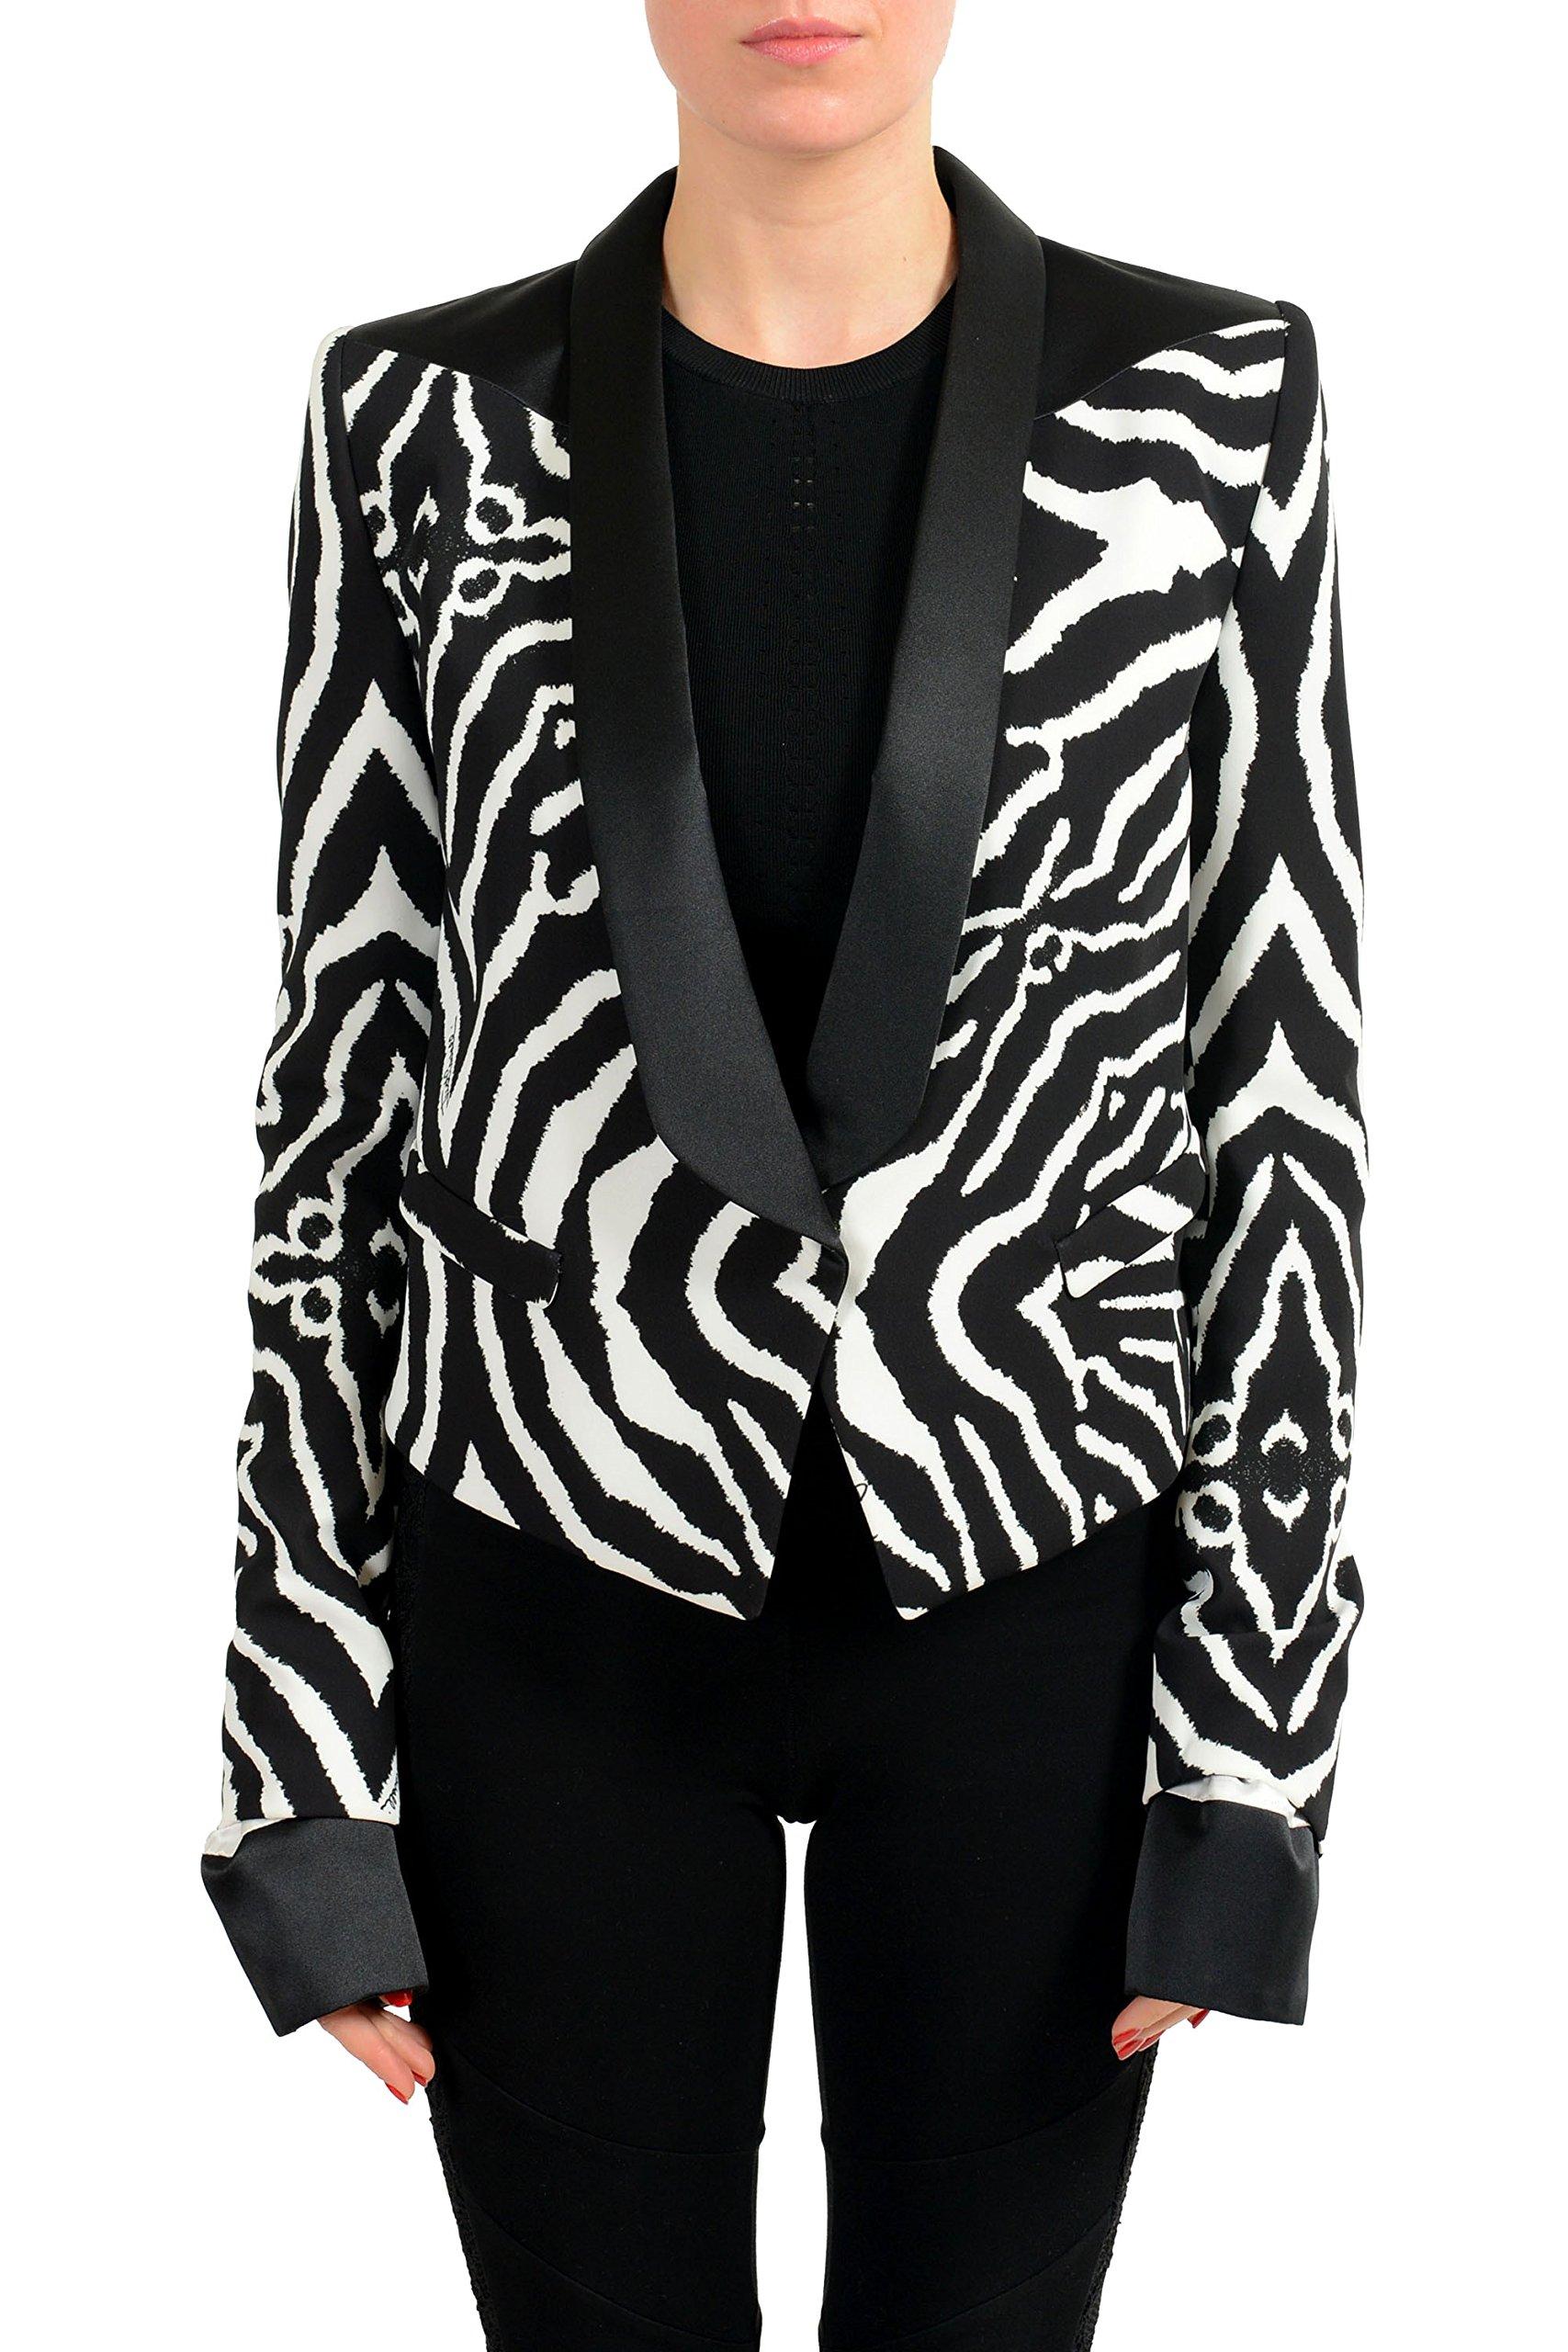 Just Cavalli Multi-Color One Button Tuxedo Style Women's Blazer US S IT 40